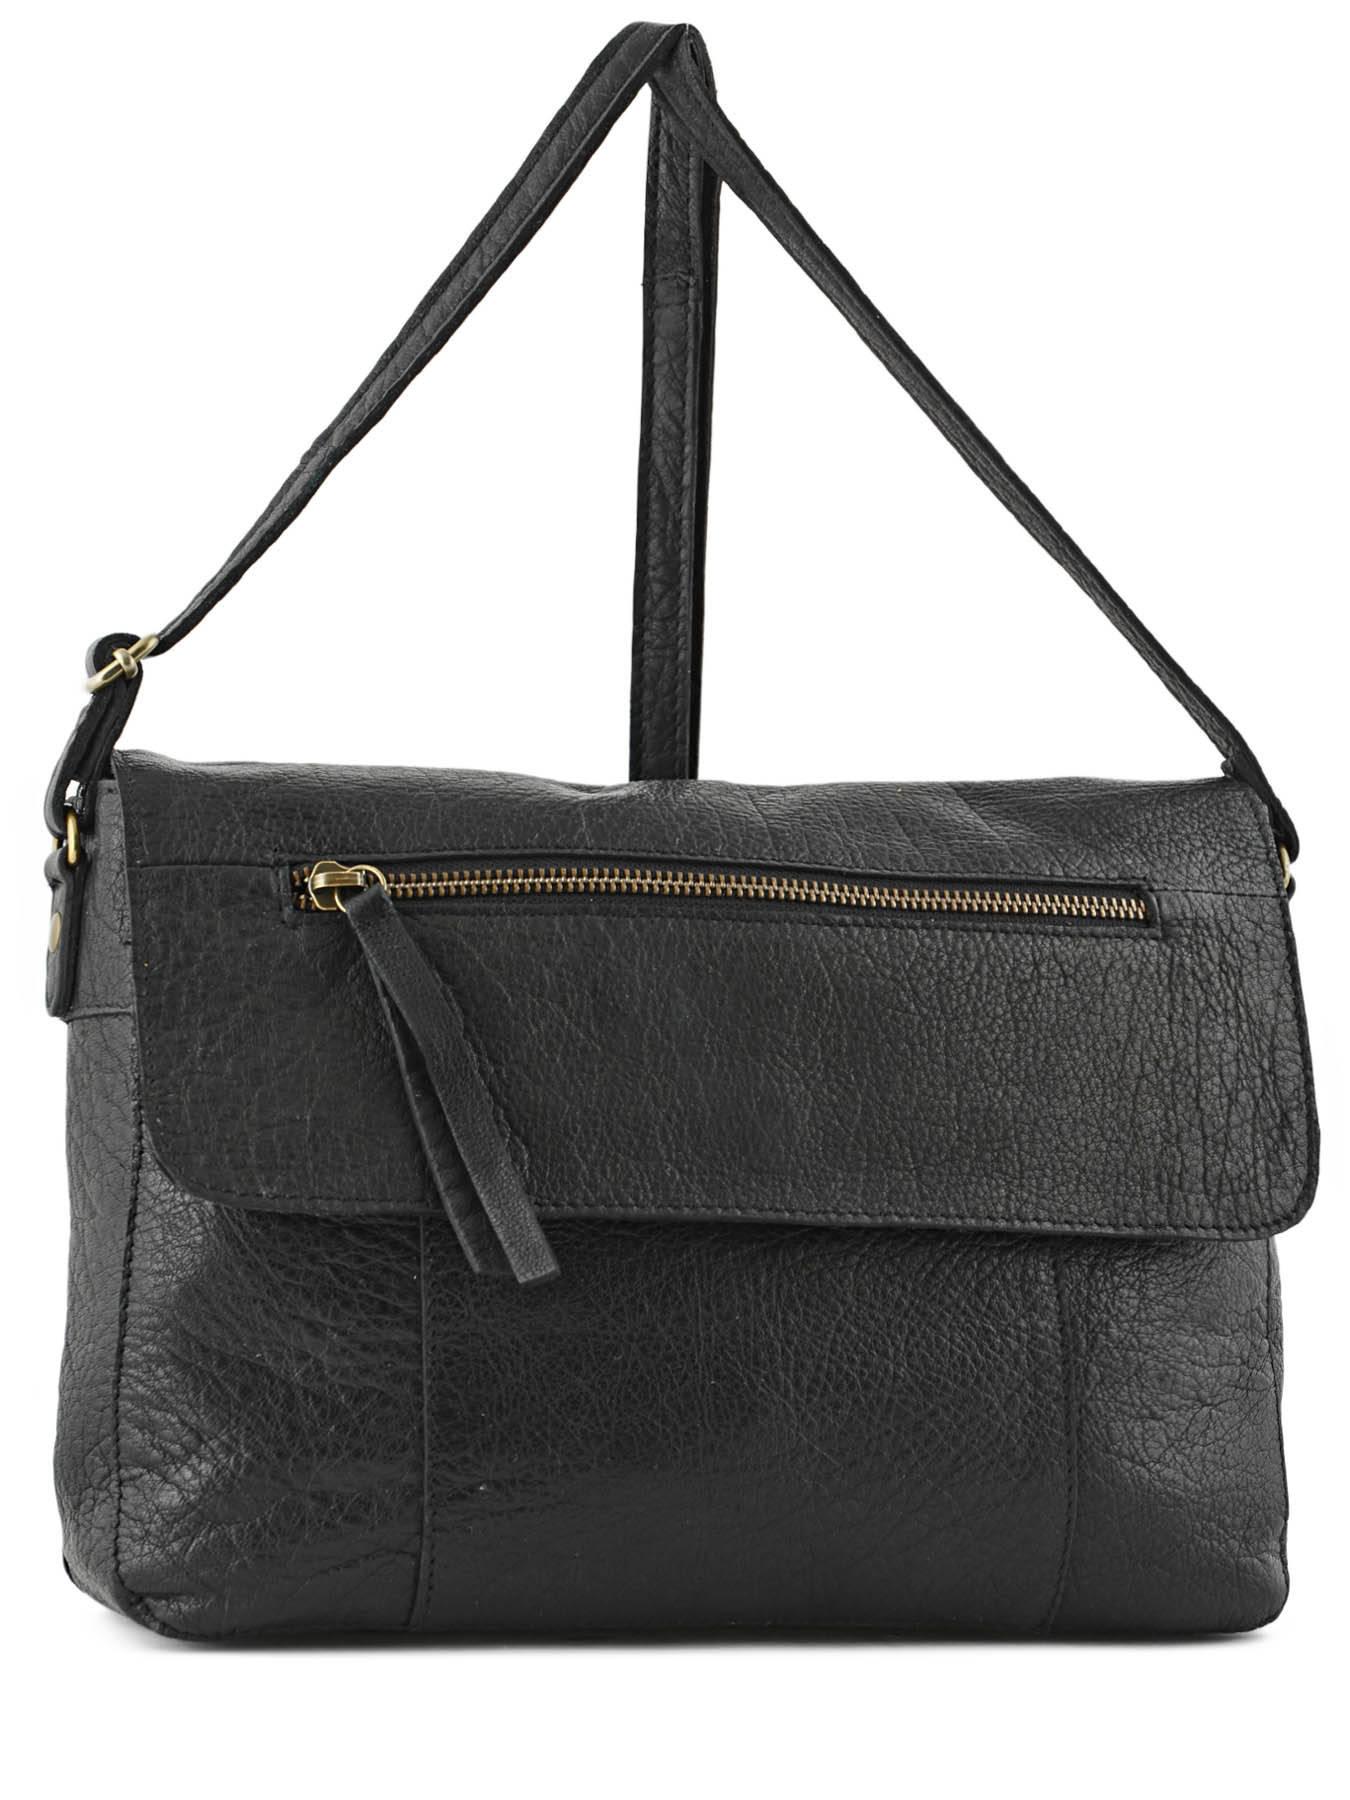 0c0ae336652 Pieces Crossbody bag KIMONO - free shipping available